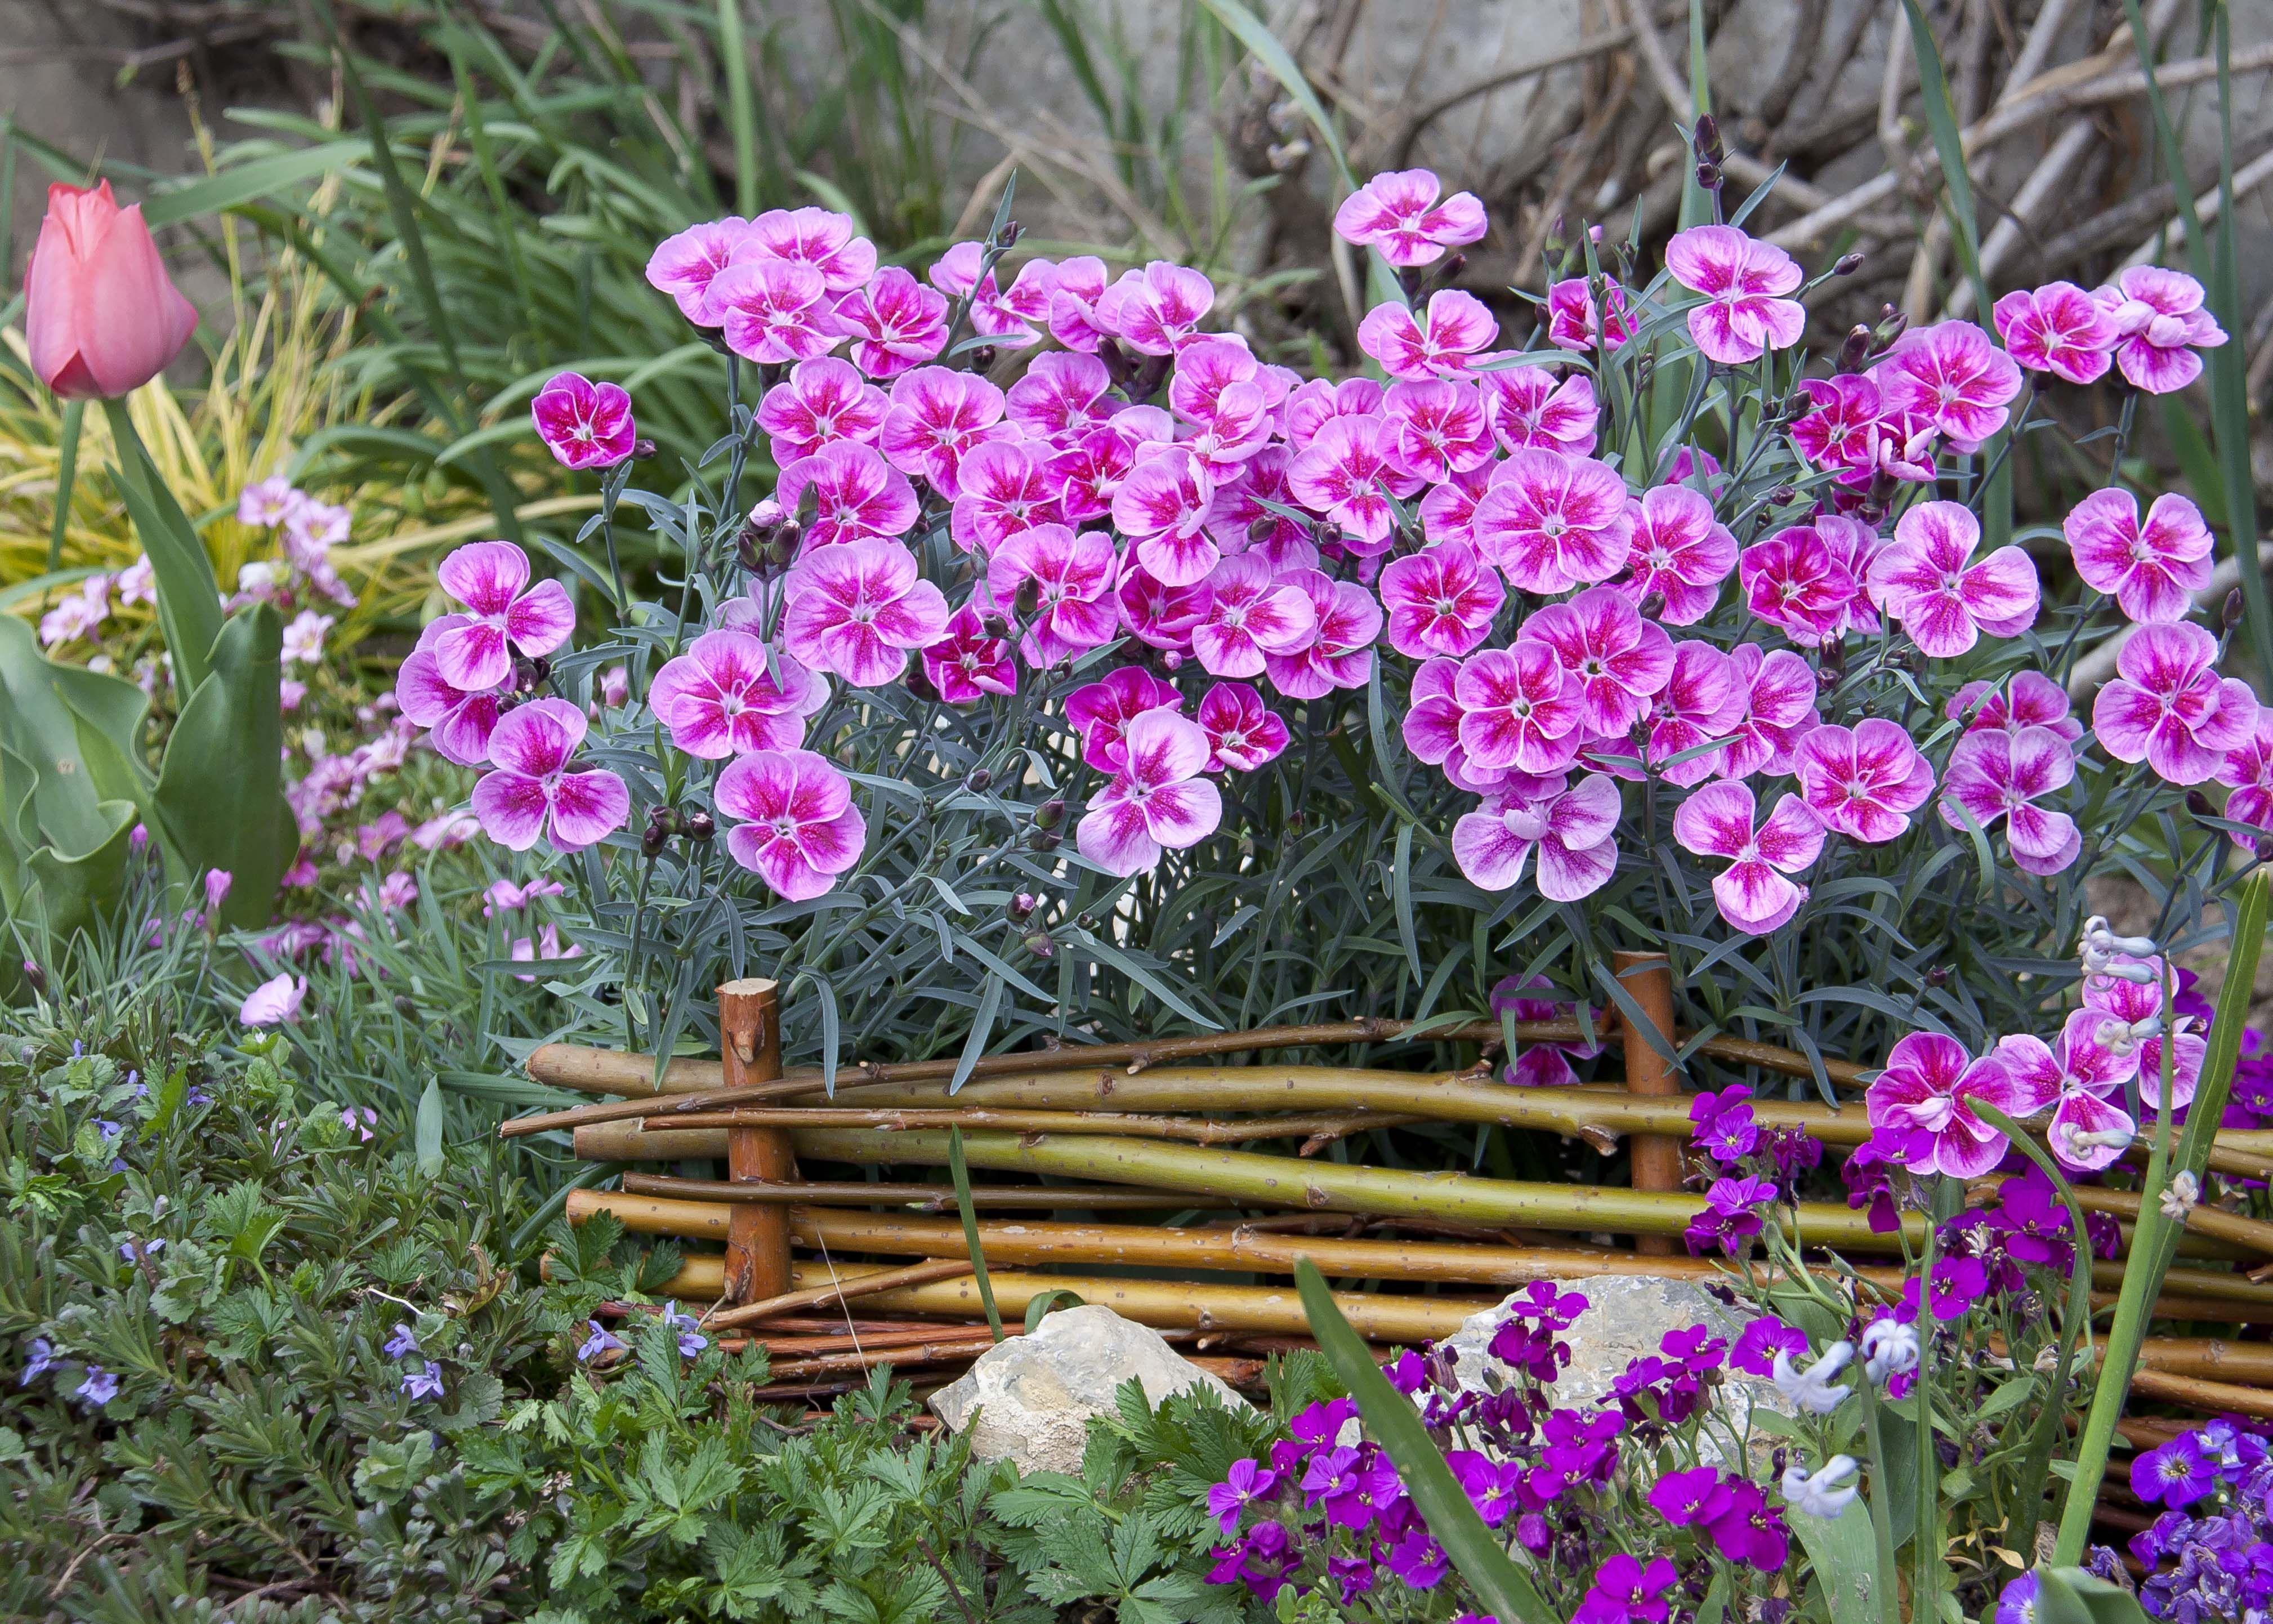 Pinke Nelken Im Beet 1000gutegruende Nelken Pink Fruhlingsgarten Nelken Blumen